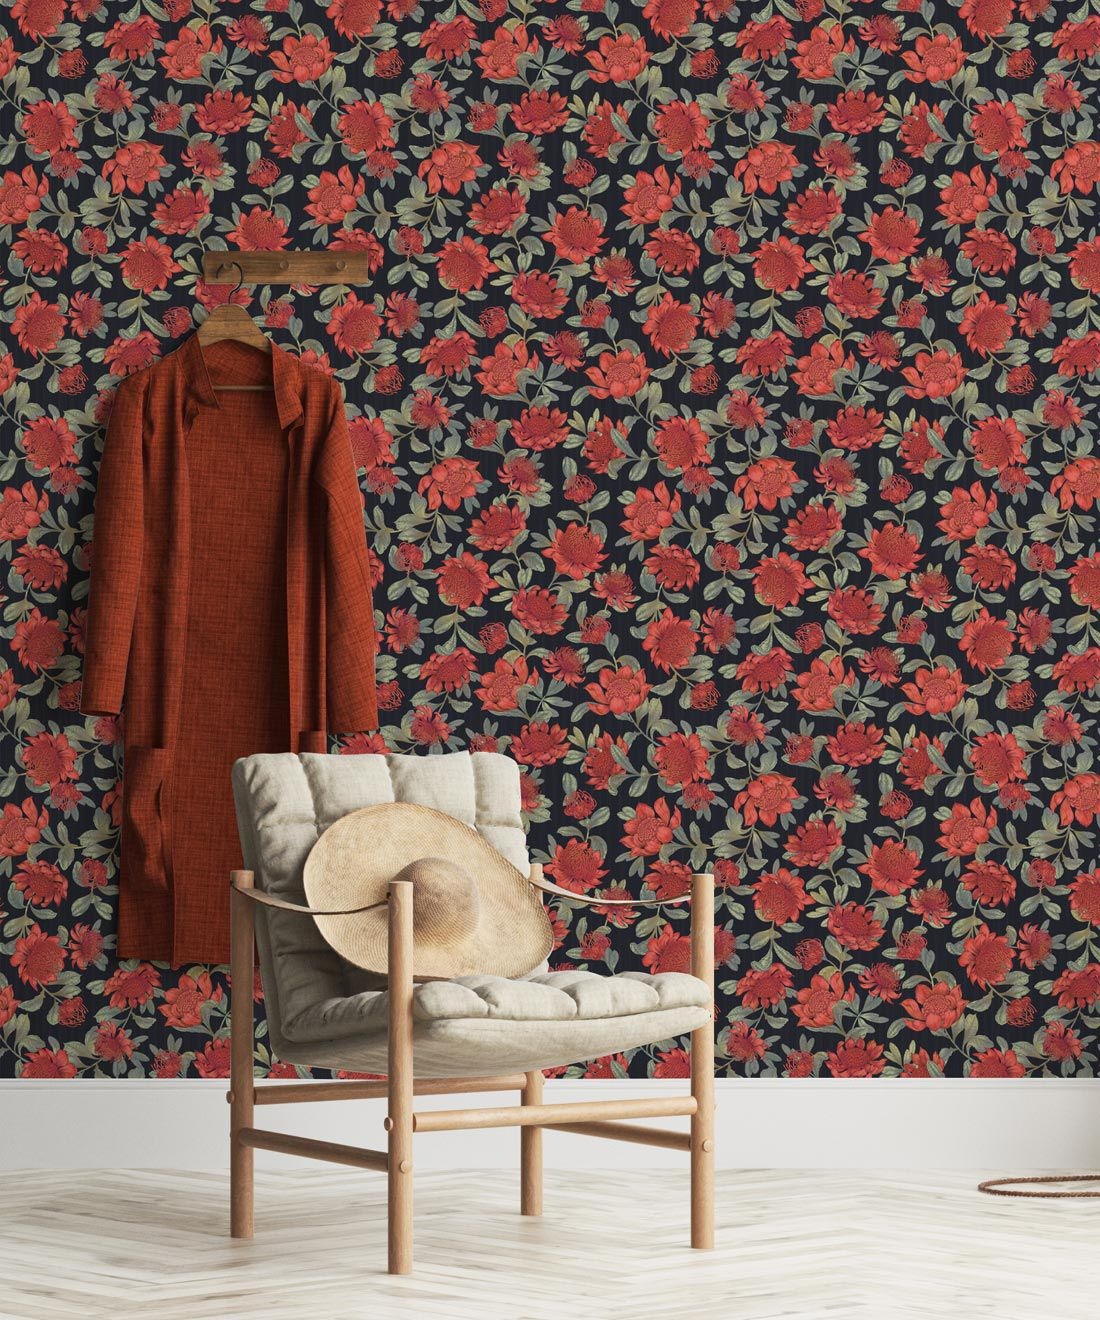 Waratah Wallpaper • Eloise Short • Vintage Floral Wallpaper •Granny Chic Wallpaper • Grandmillennial Style Wallpaper •Slate • Insitu